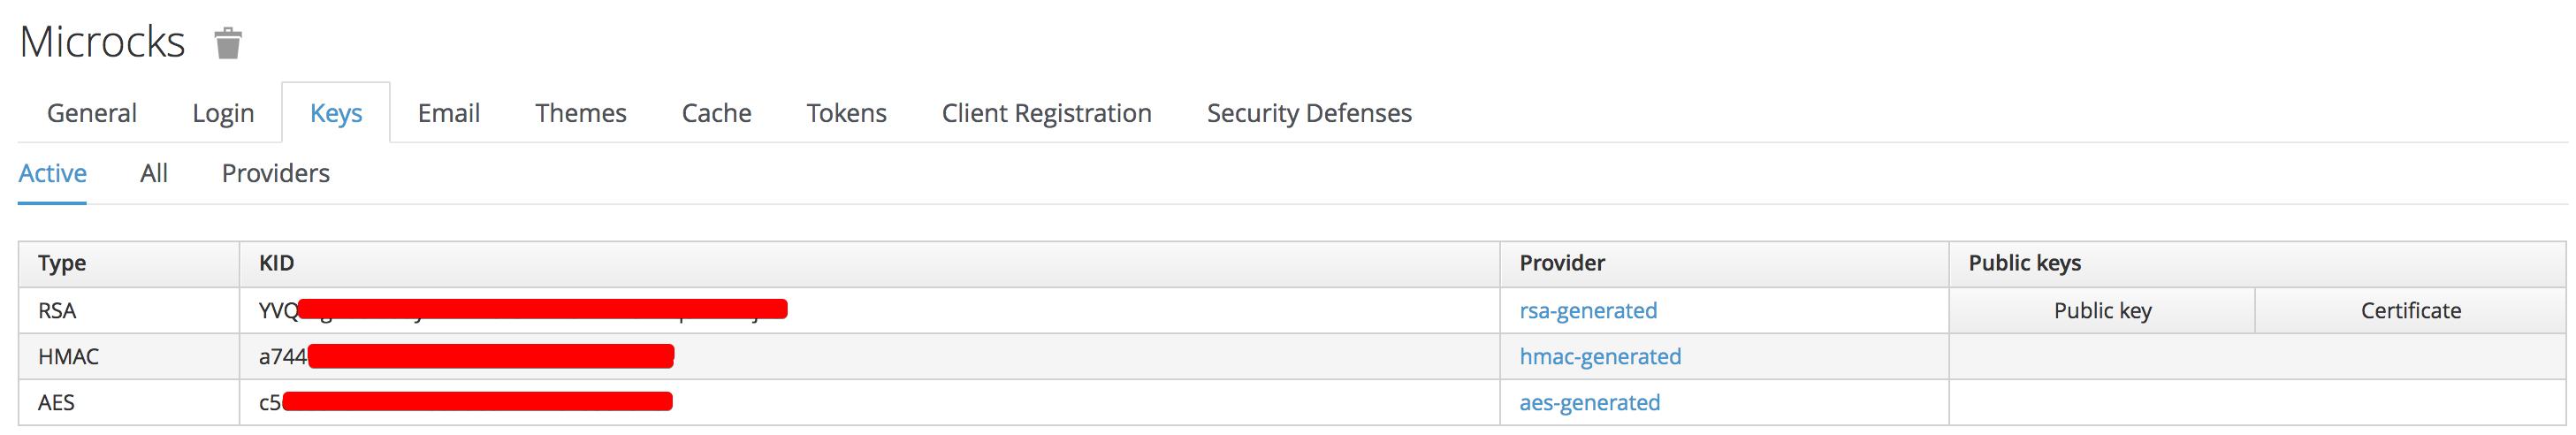 Docker-compose setup on MacOS: the microcks service is